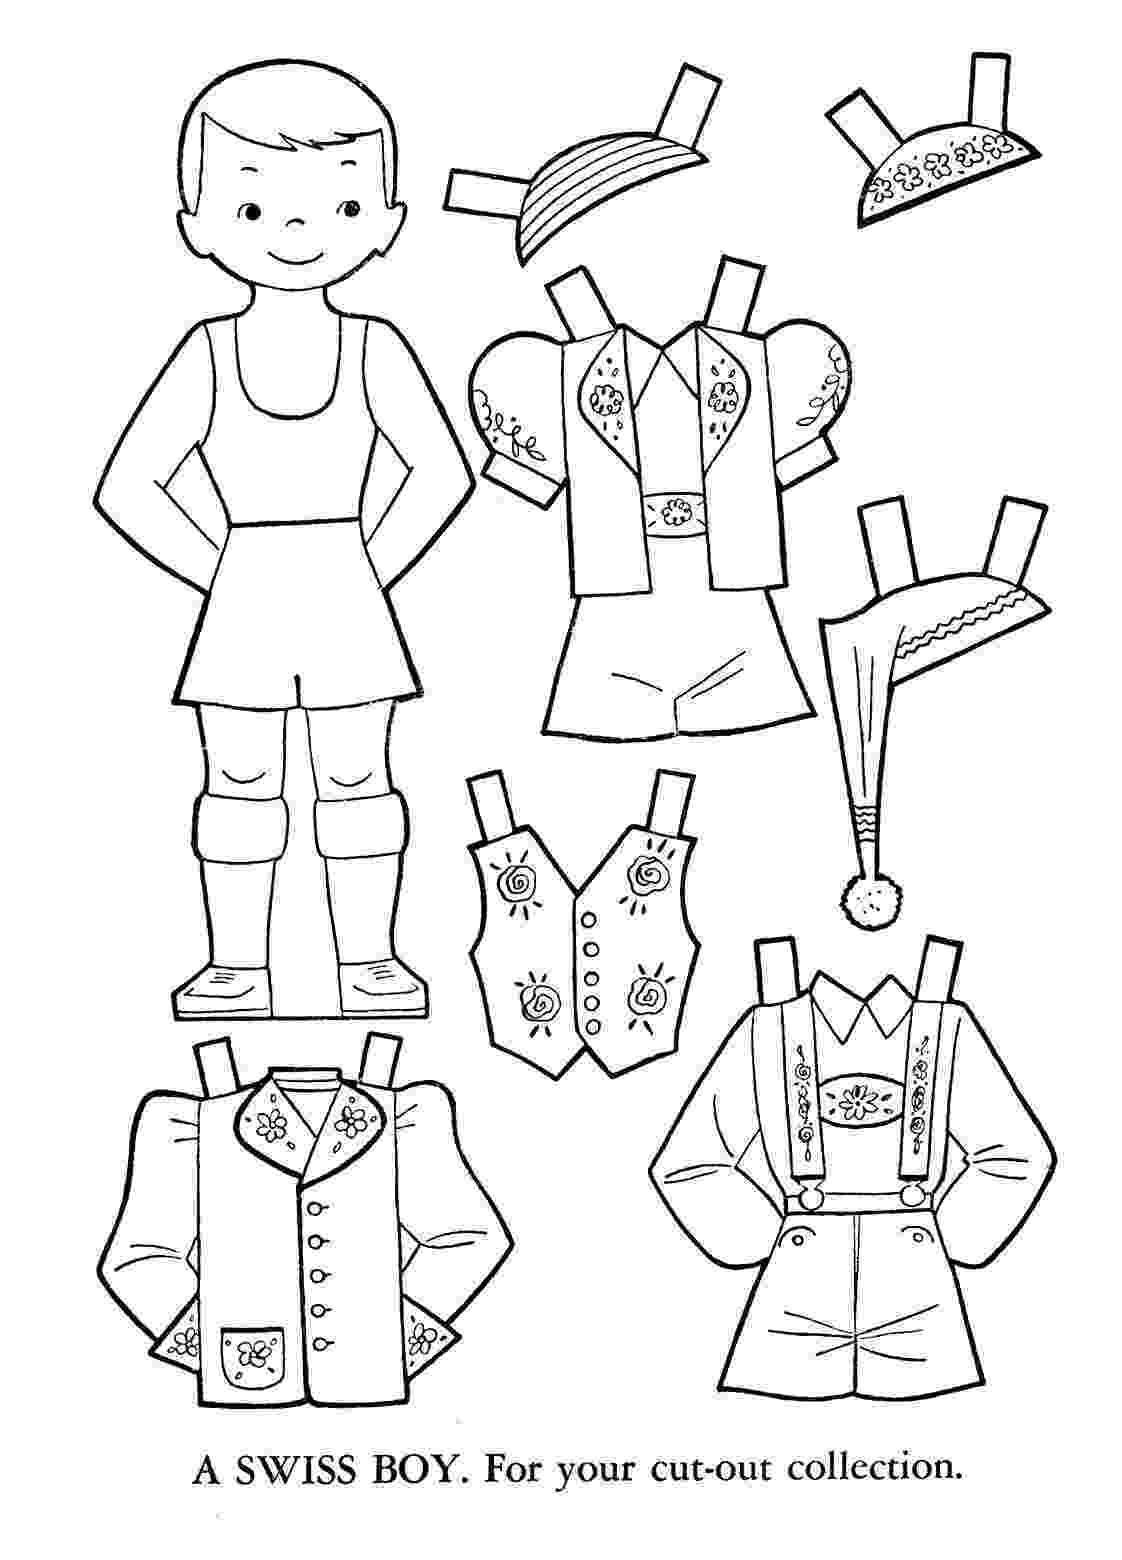 paper dressing up dolls outlines of dress up dolls different colountries paper dolls paper up dressing